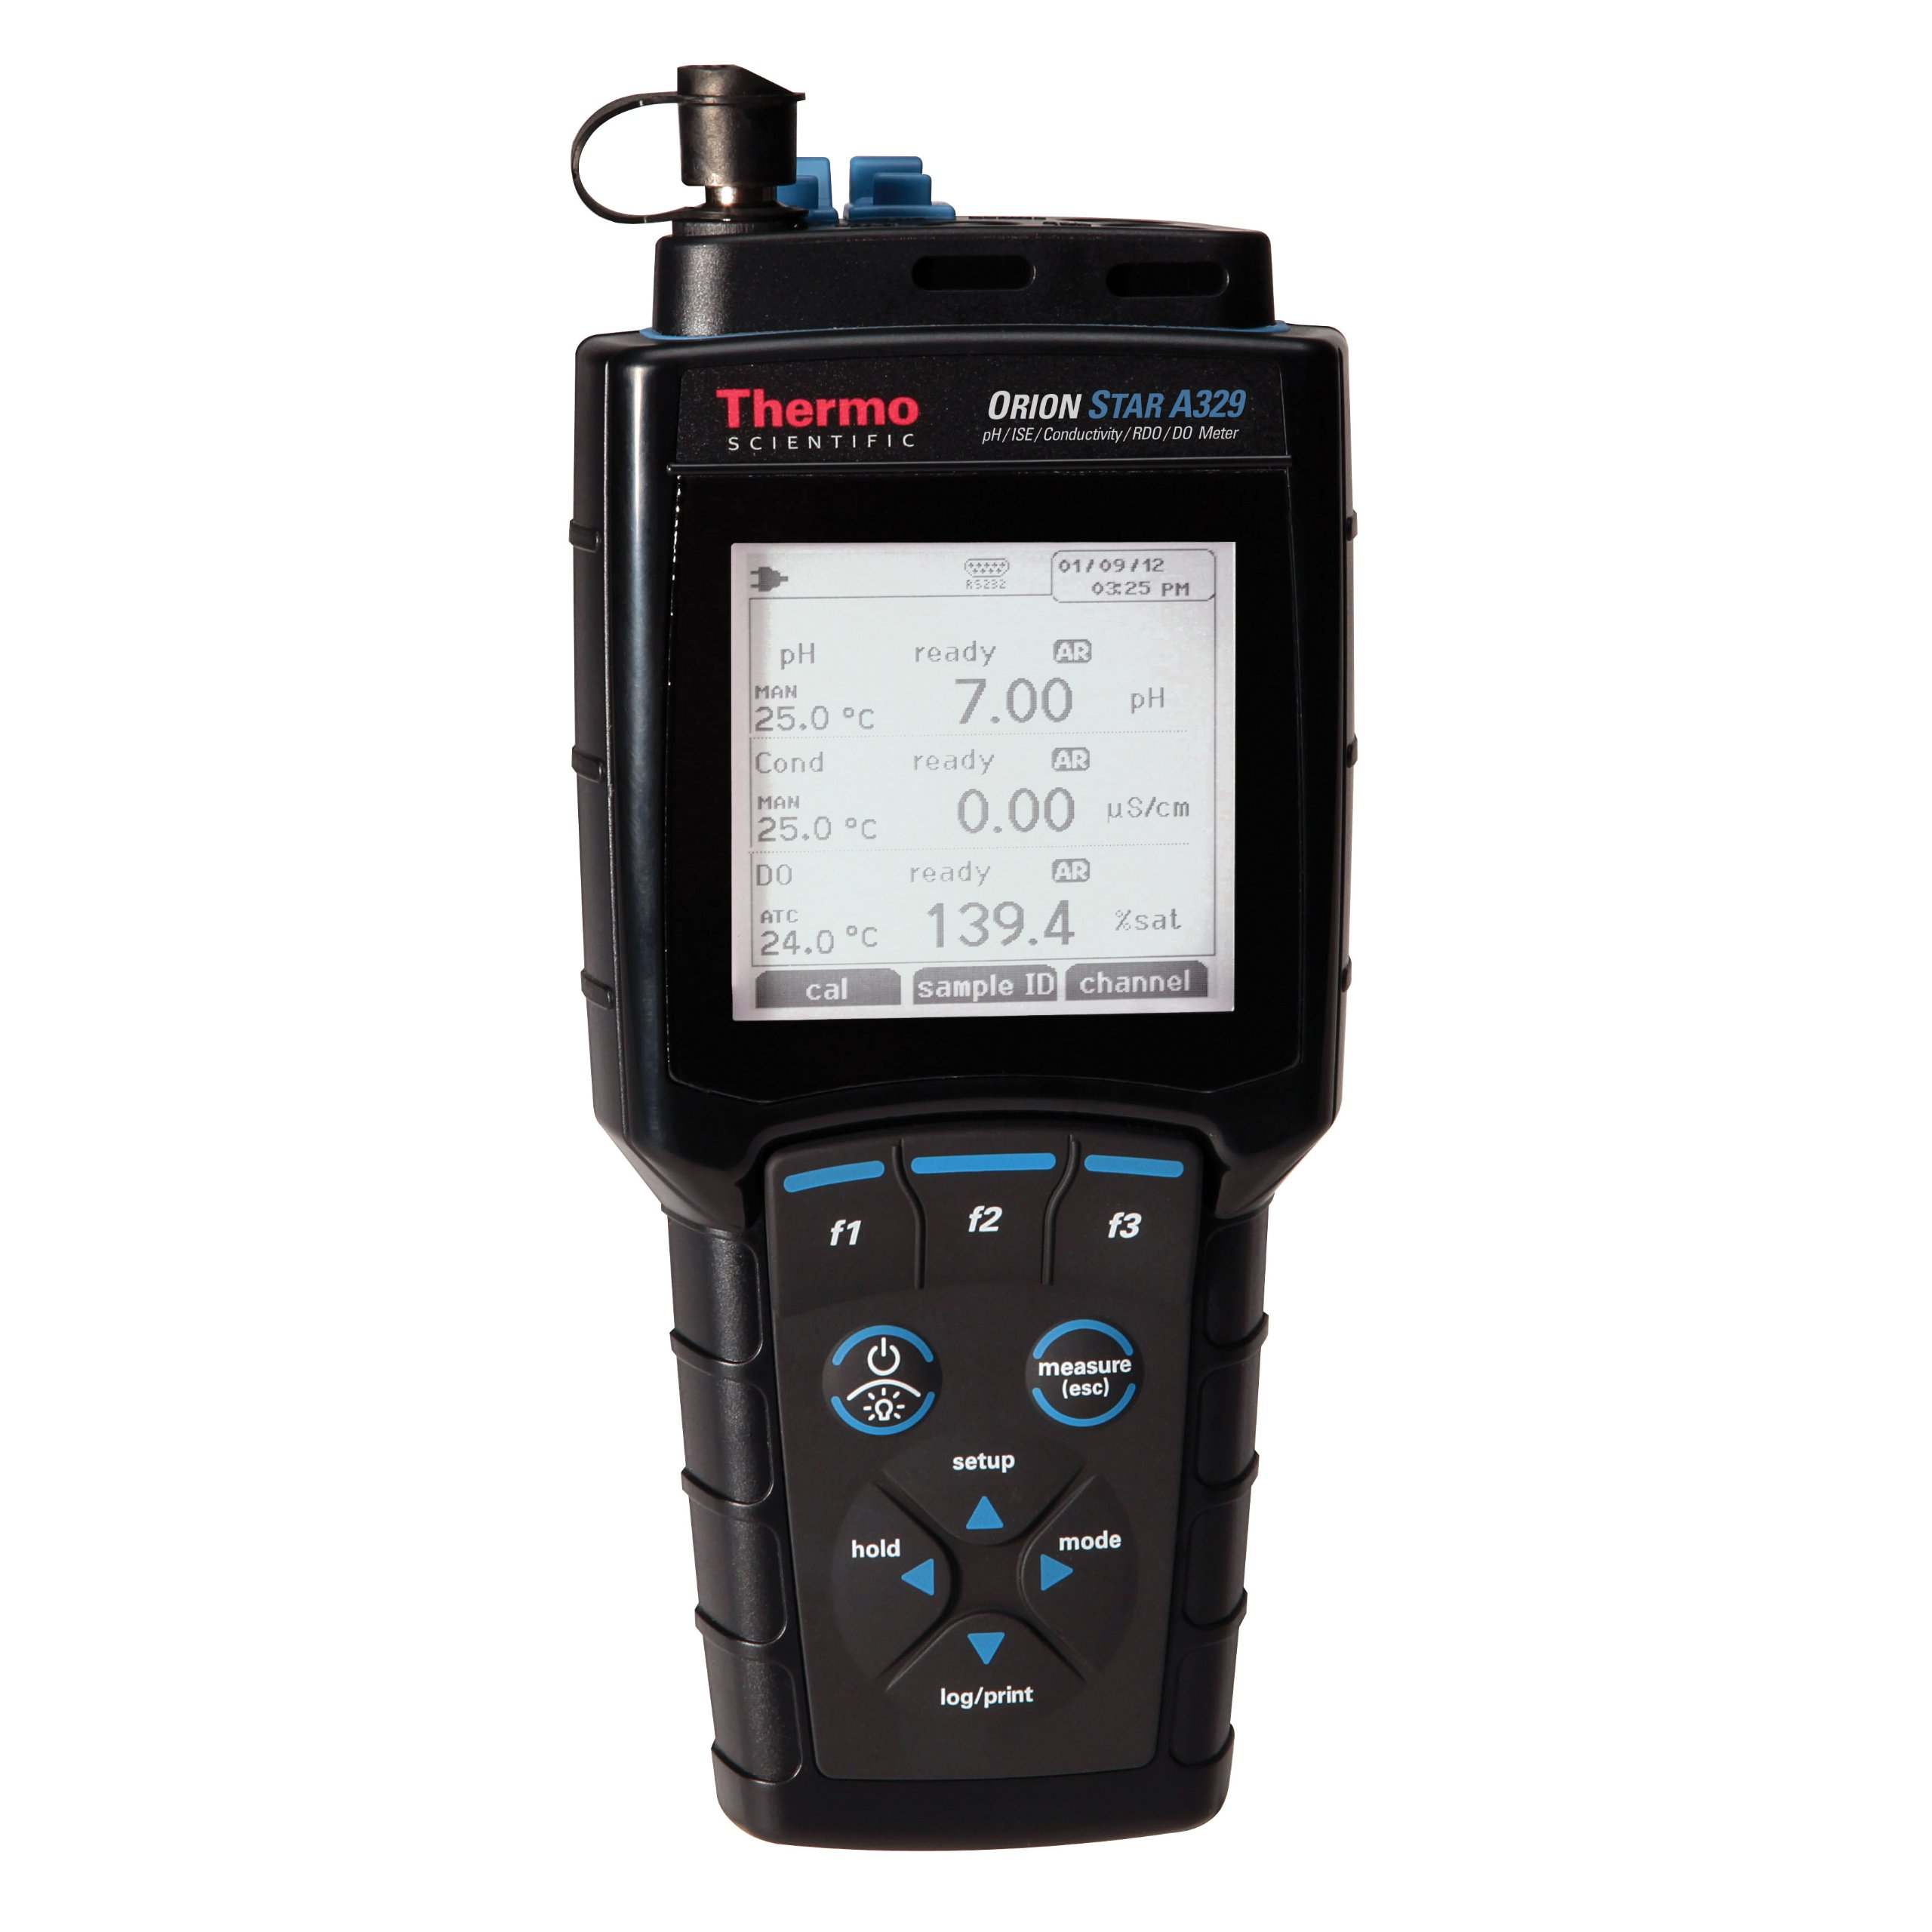 Thermo Scientific Orion Star A329 Portable pH/ISE/Conductivity/RDO/DO/Temperature Multiparameter Meter, -2.000 to 20.000 pH Range by Thermo Scientific Orion